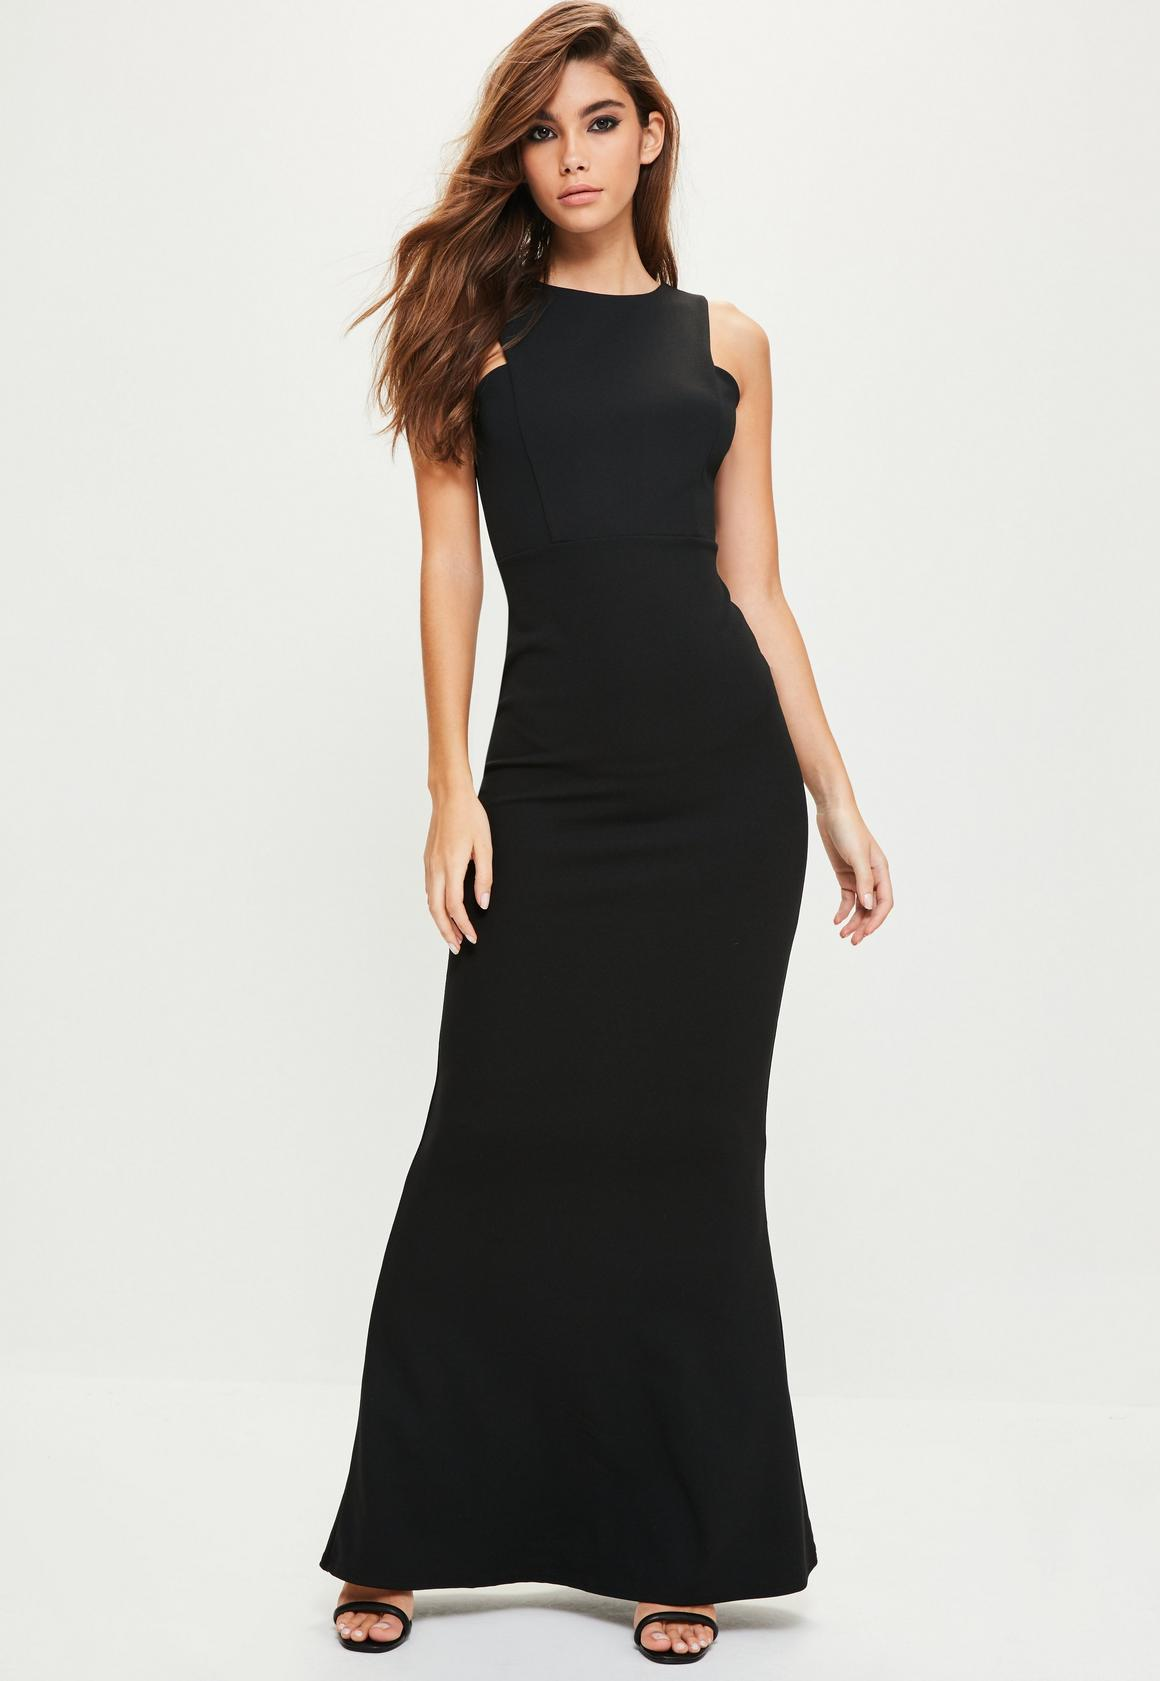 Black halter maxi dress uk